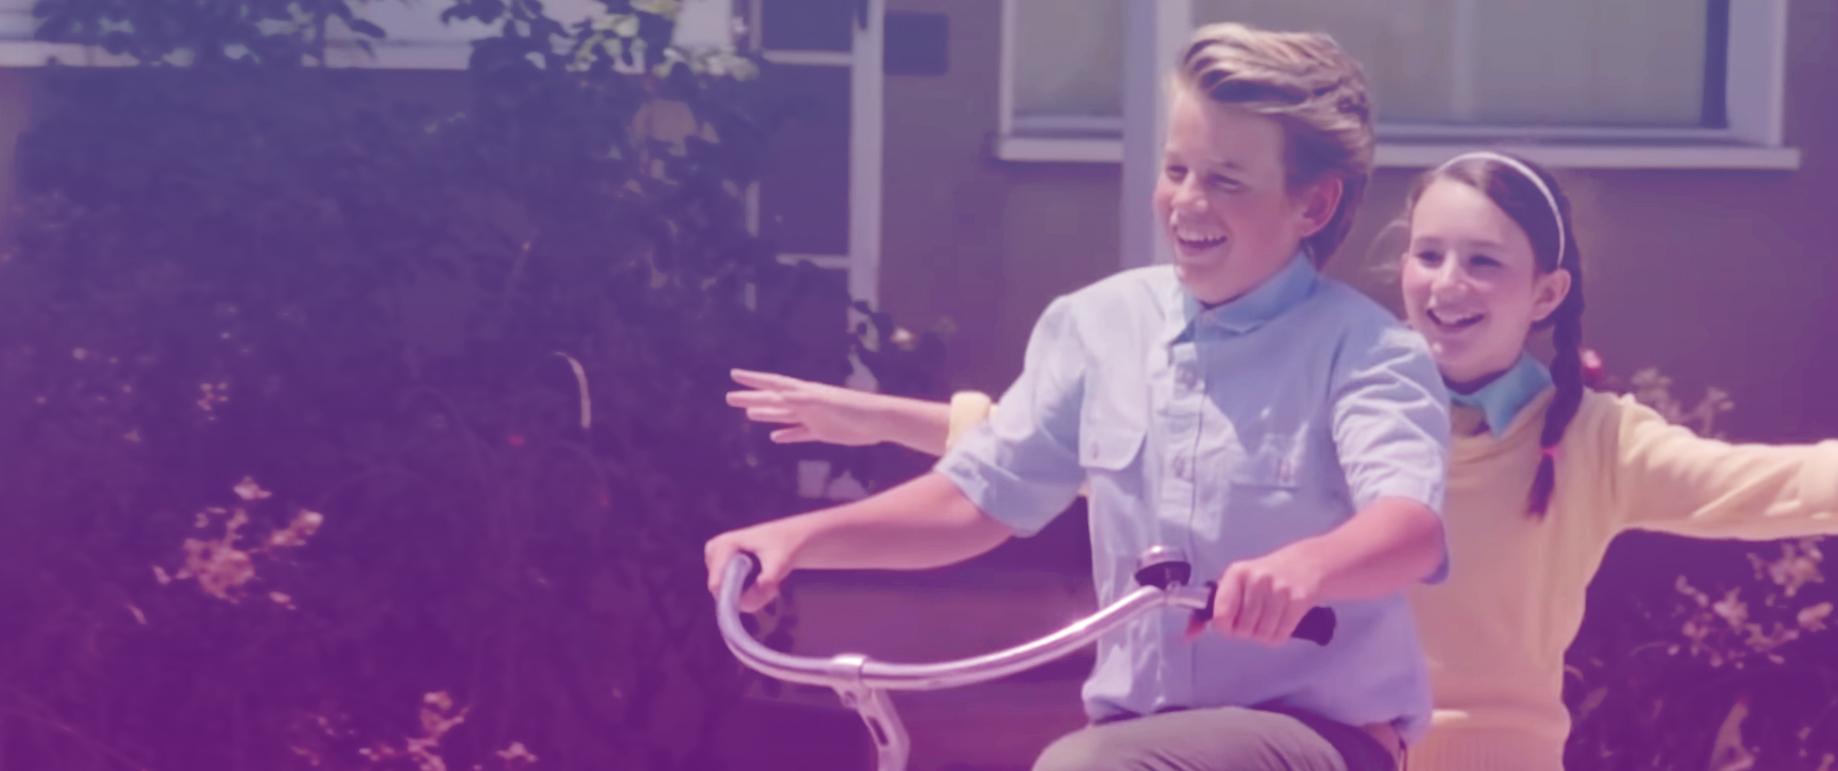 CoPilots • Short Film - PRODUCER